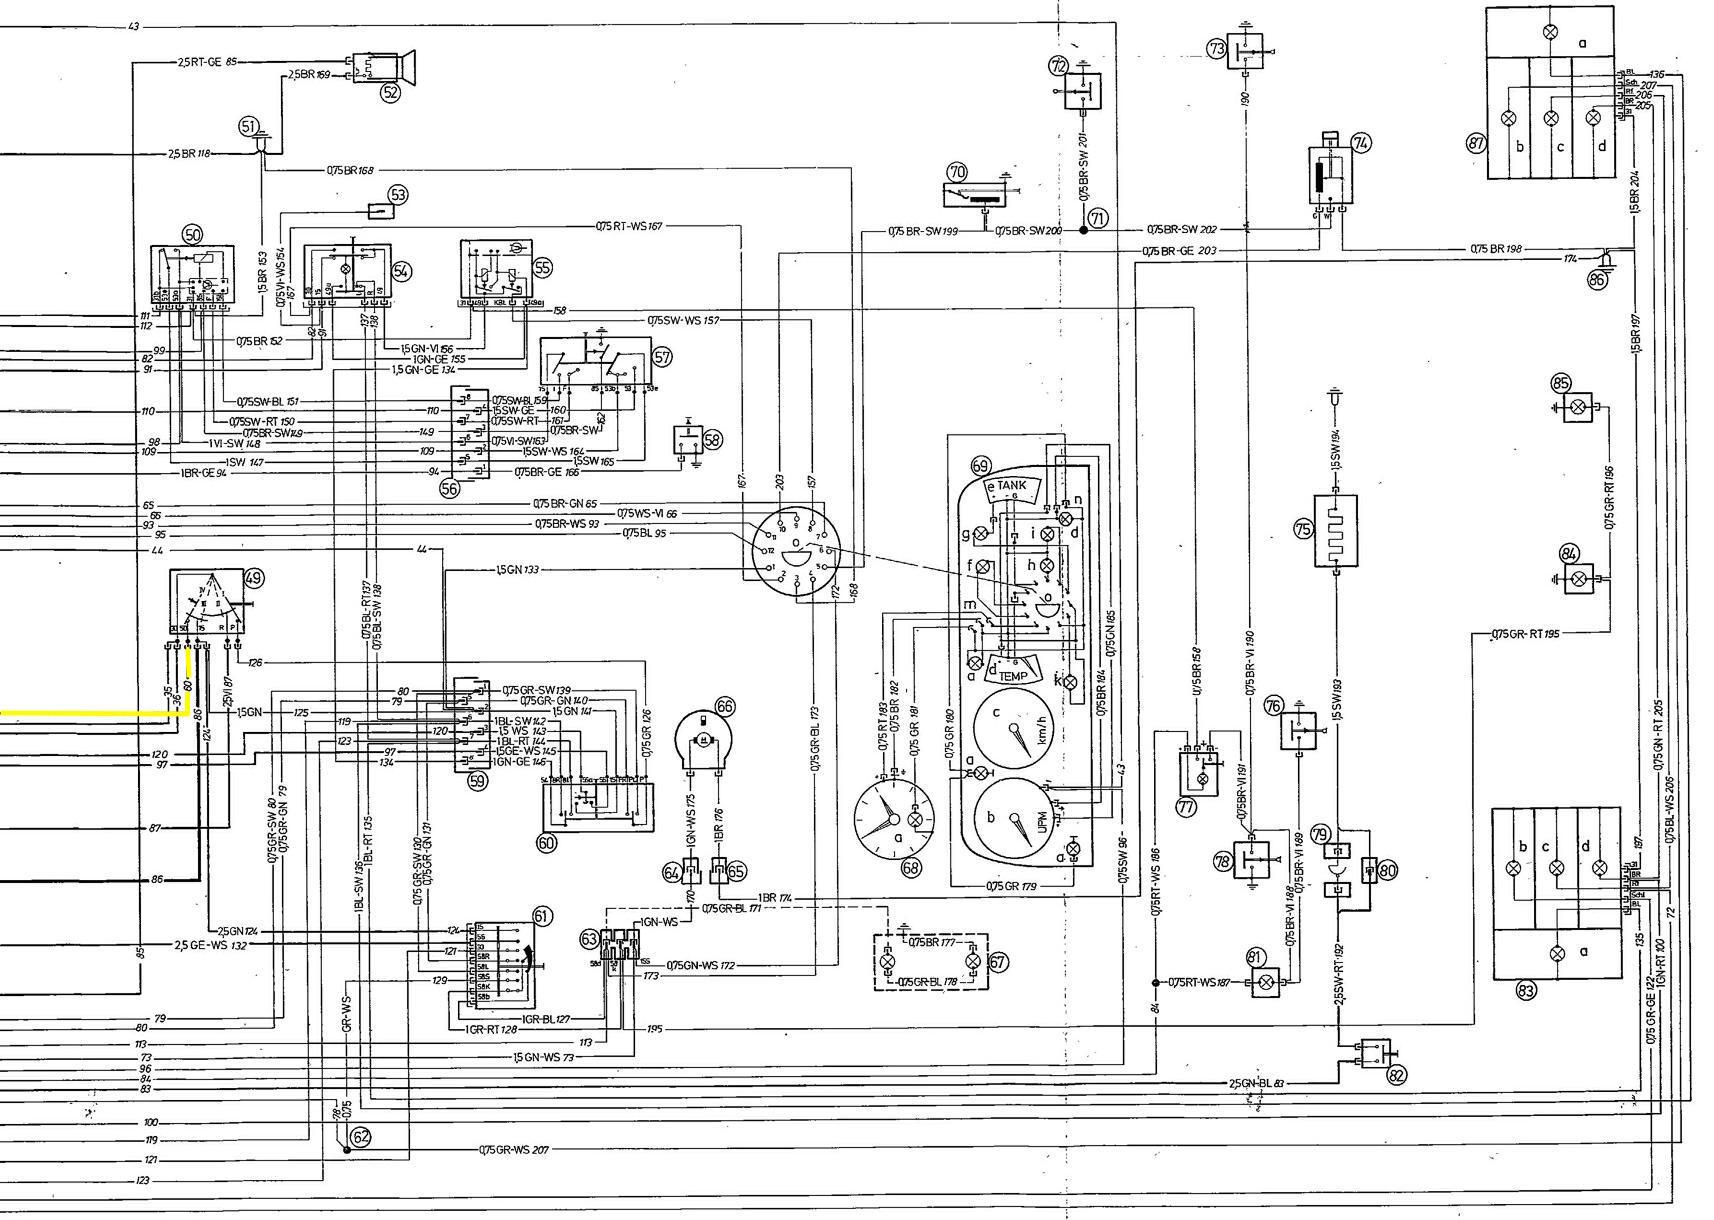 1970 bmw 2002 wiring harness